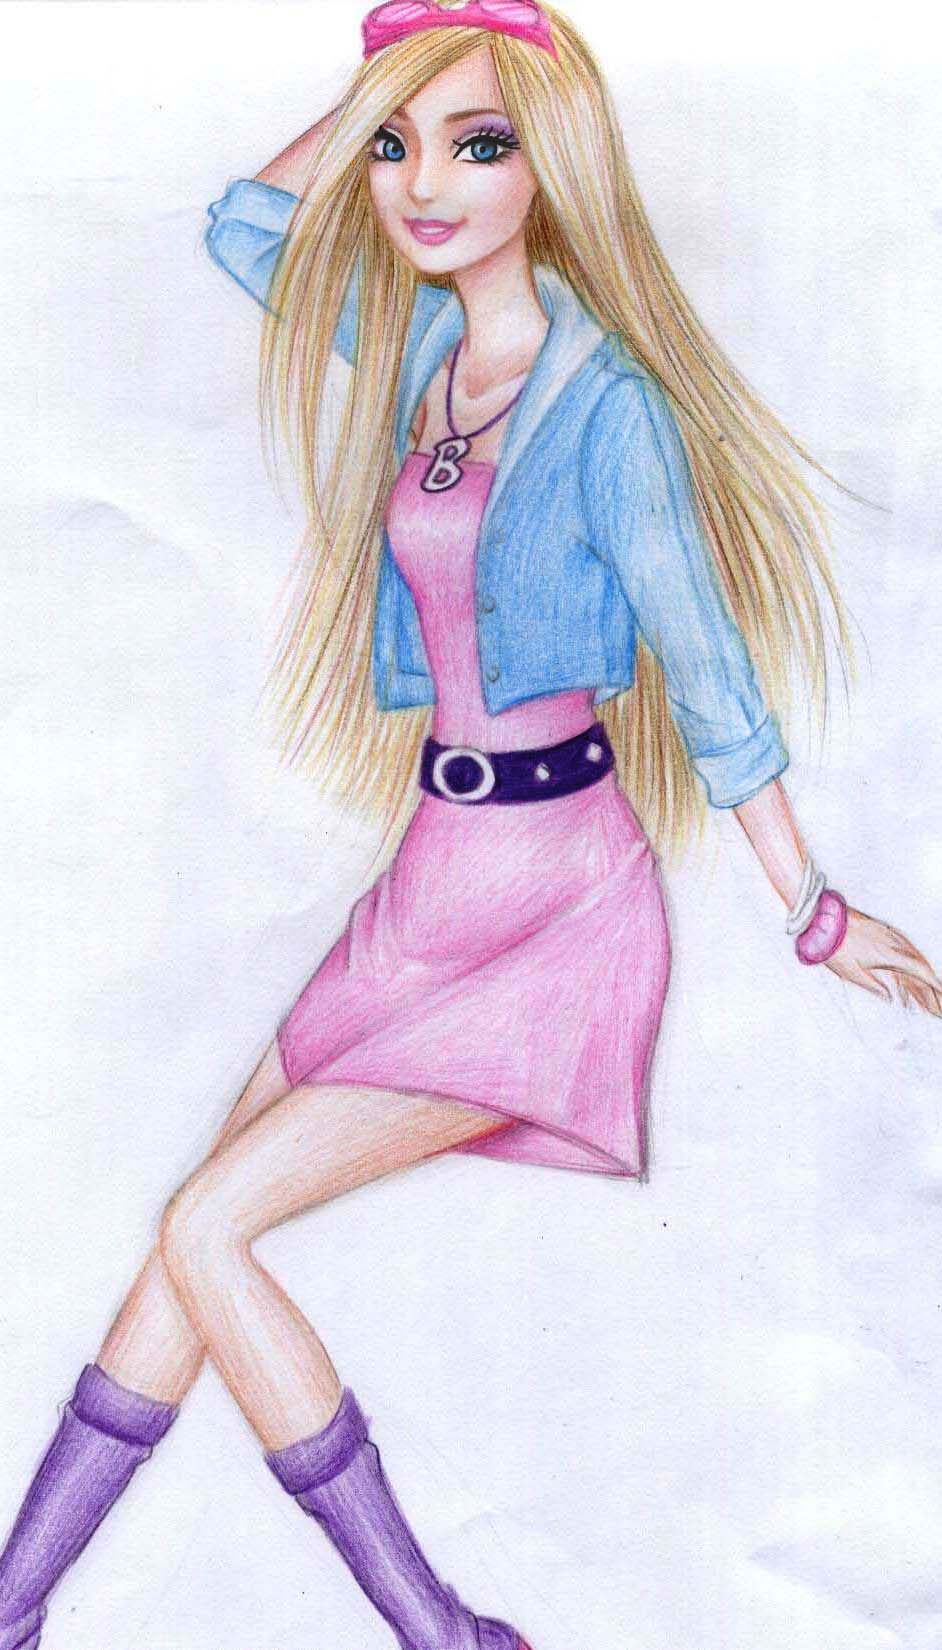 barbie barbie barbie barbie barbie